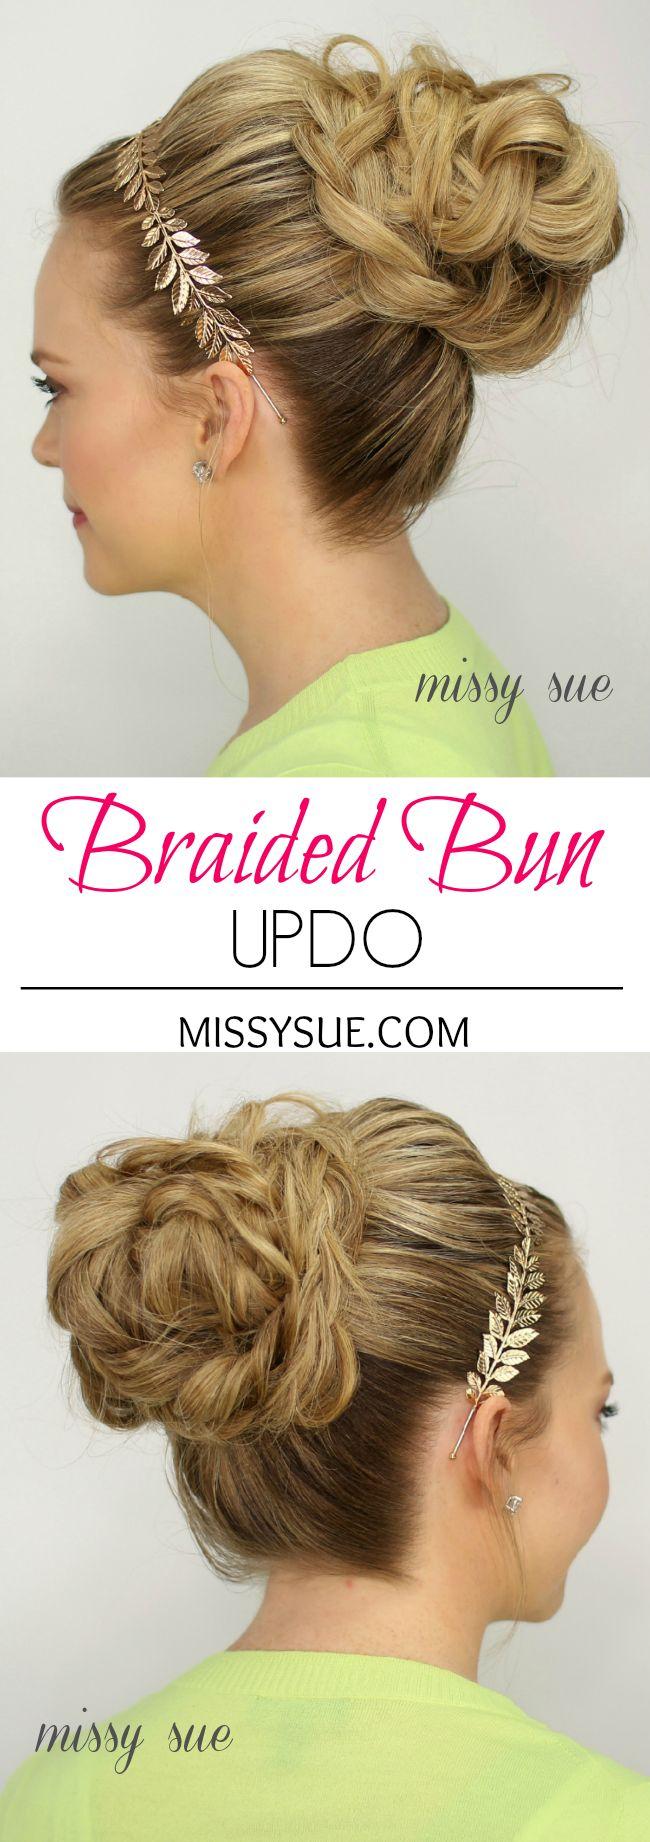 best summer hair images on pinterest hair dos bridal